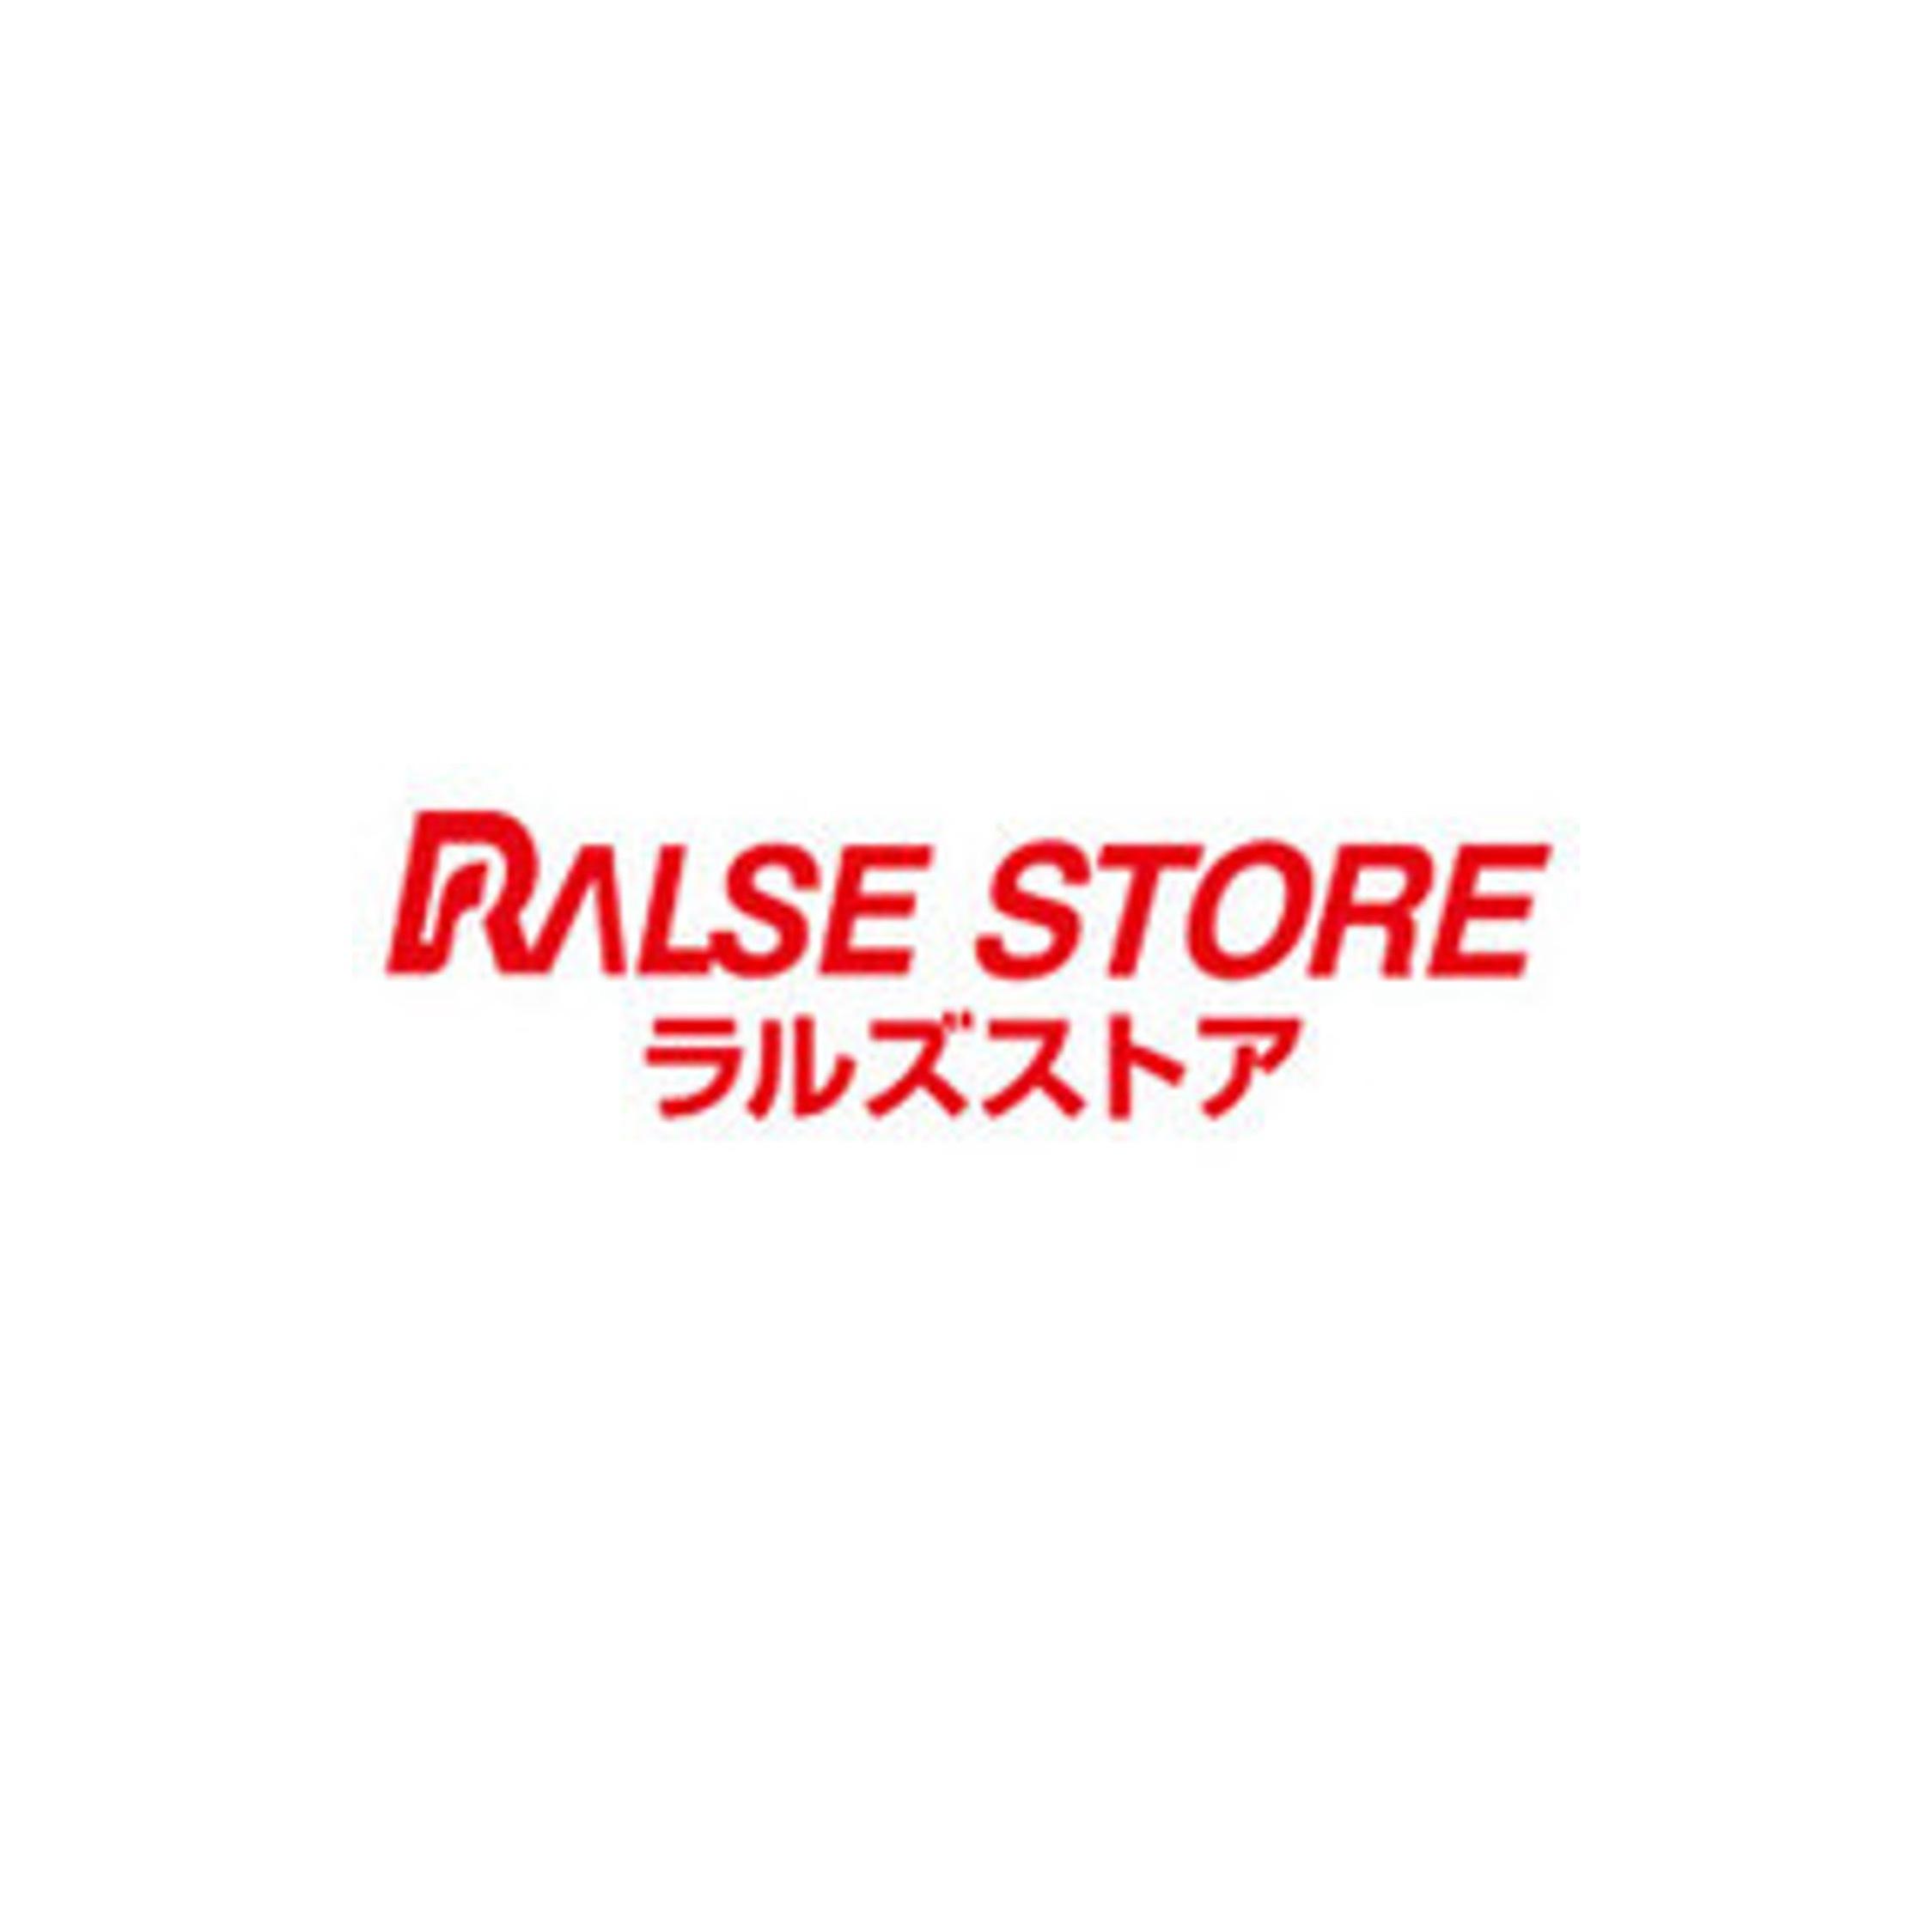 Logo ralse